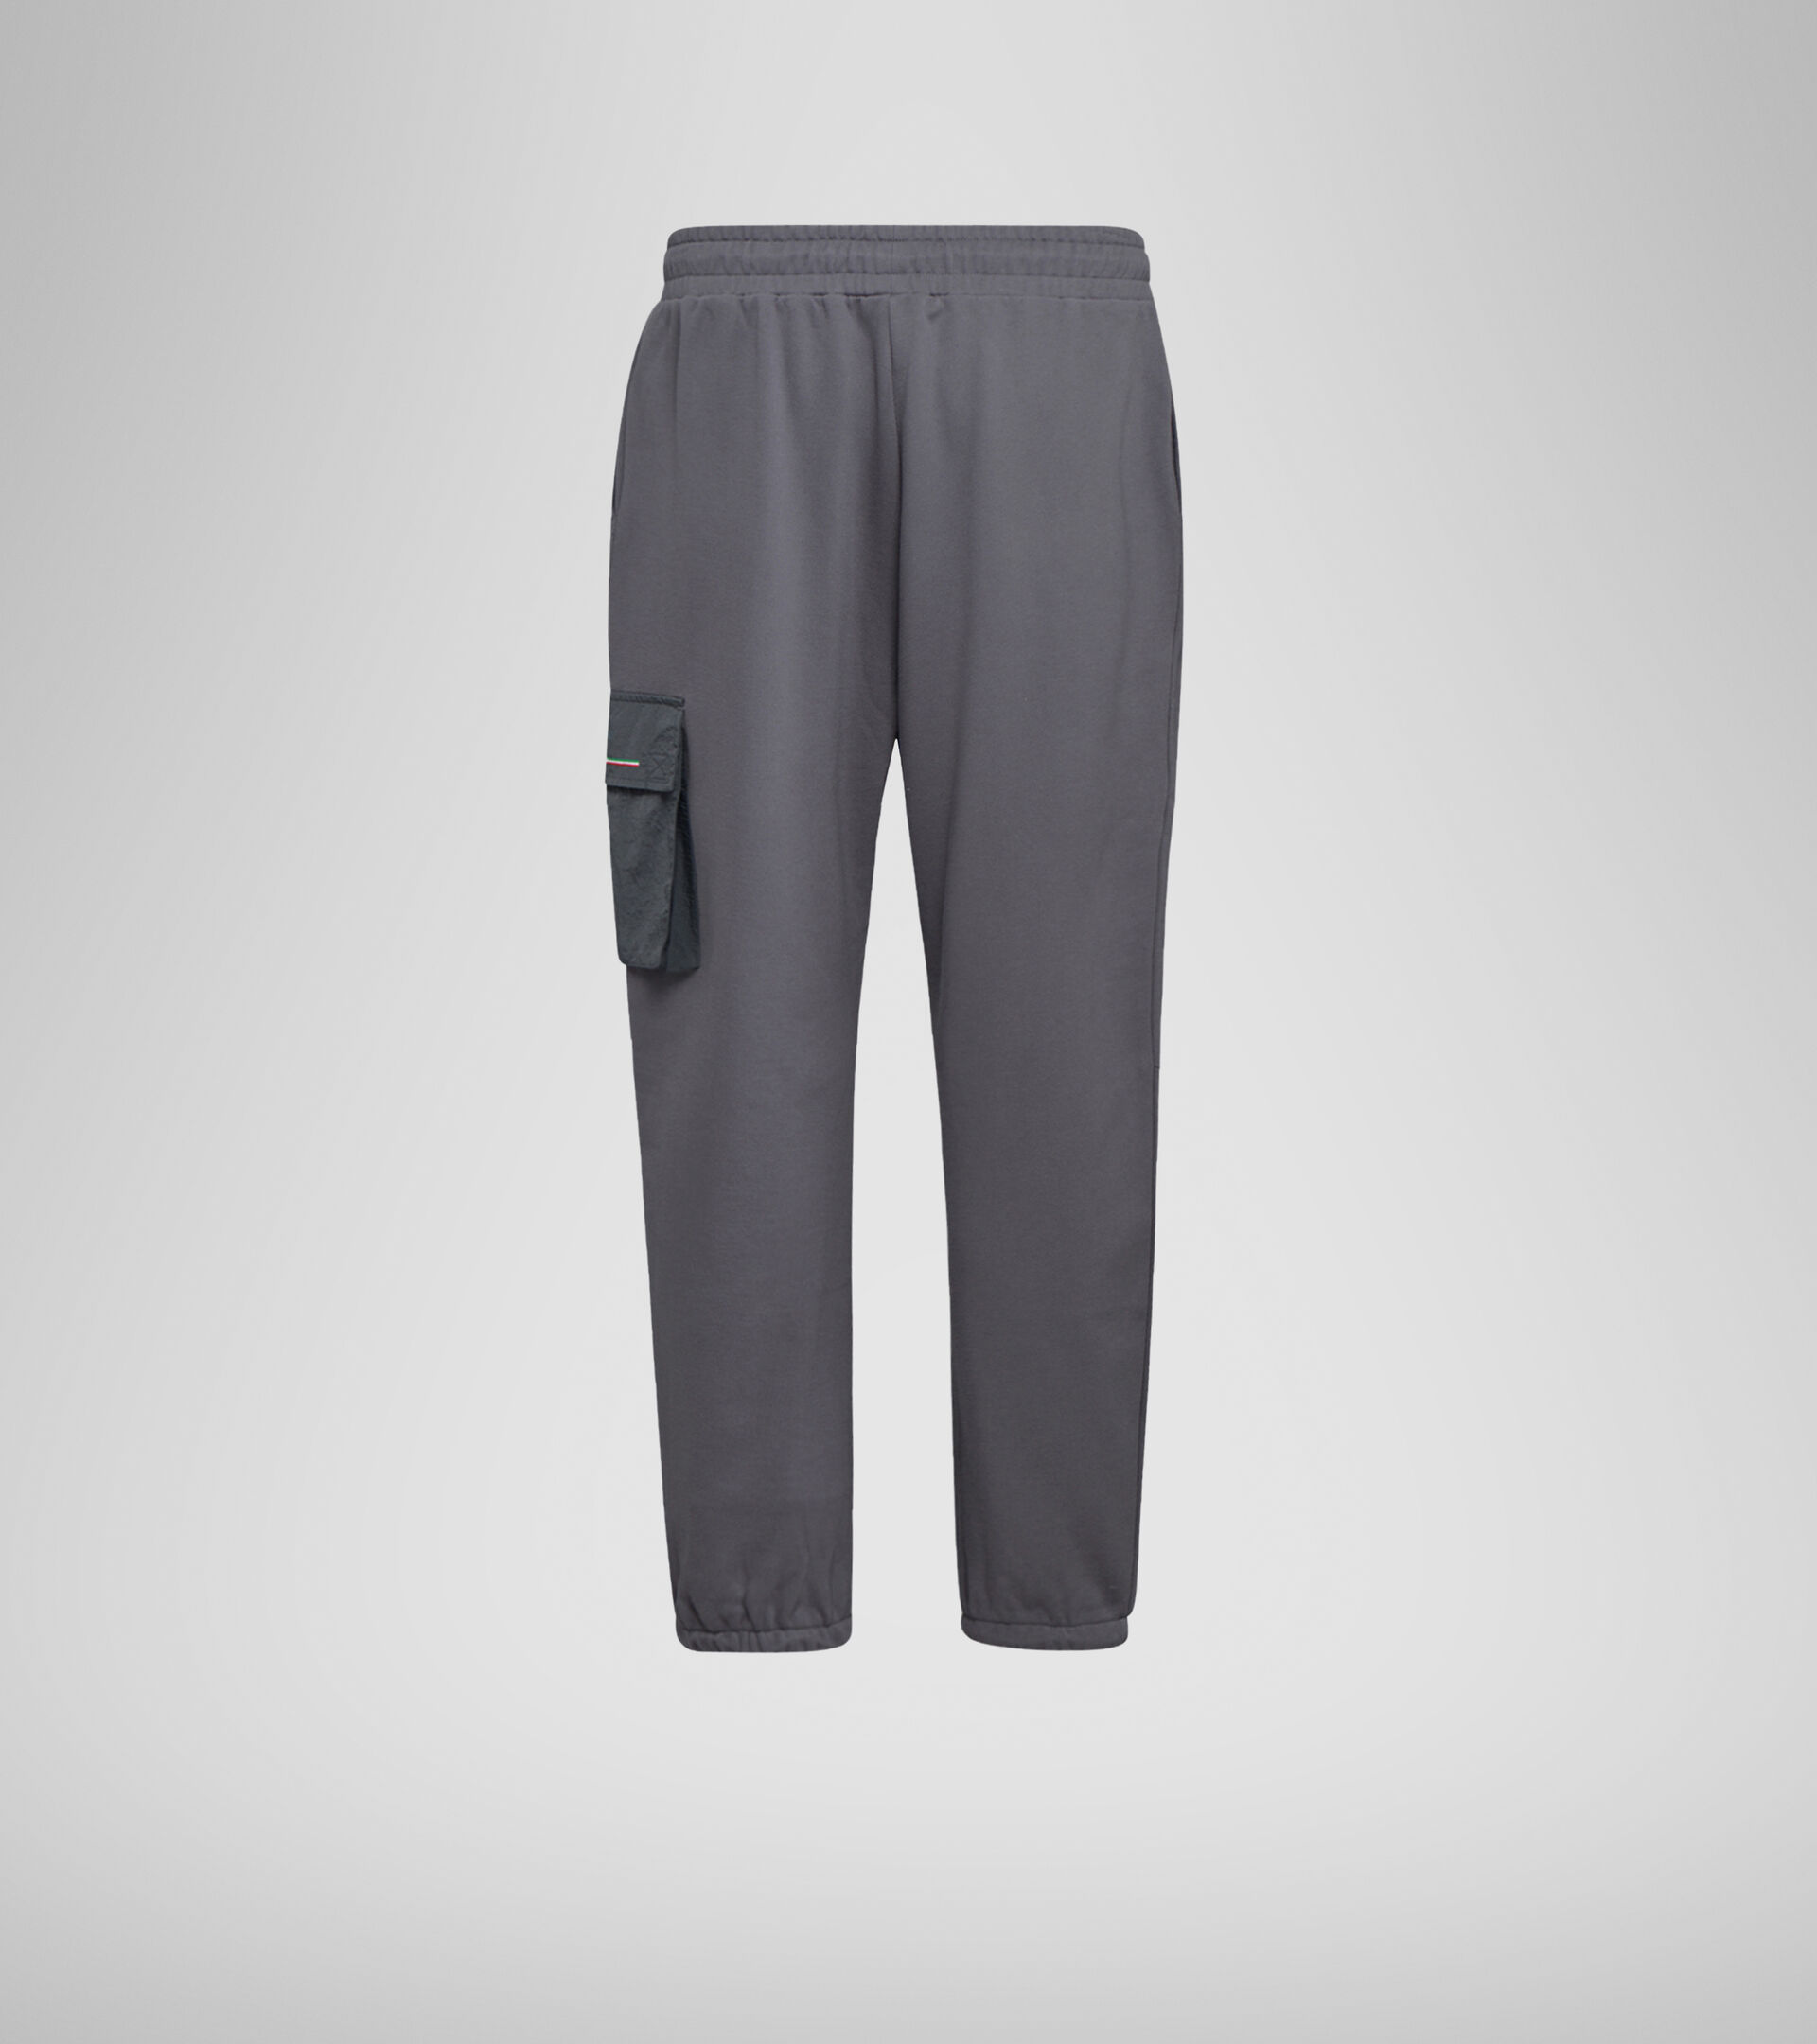 Apparel Sportswear UOMO PANT URBANITY GREY QUIET SHADE Diadora